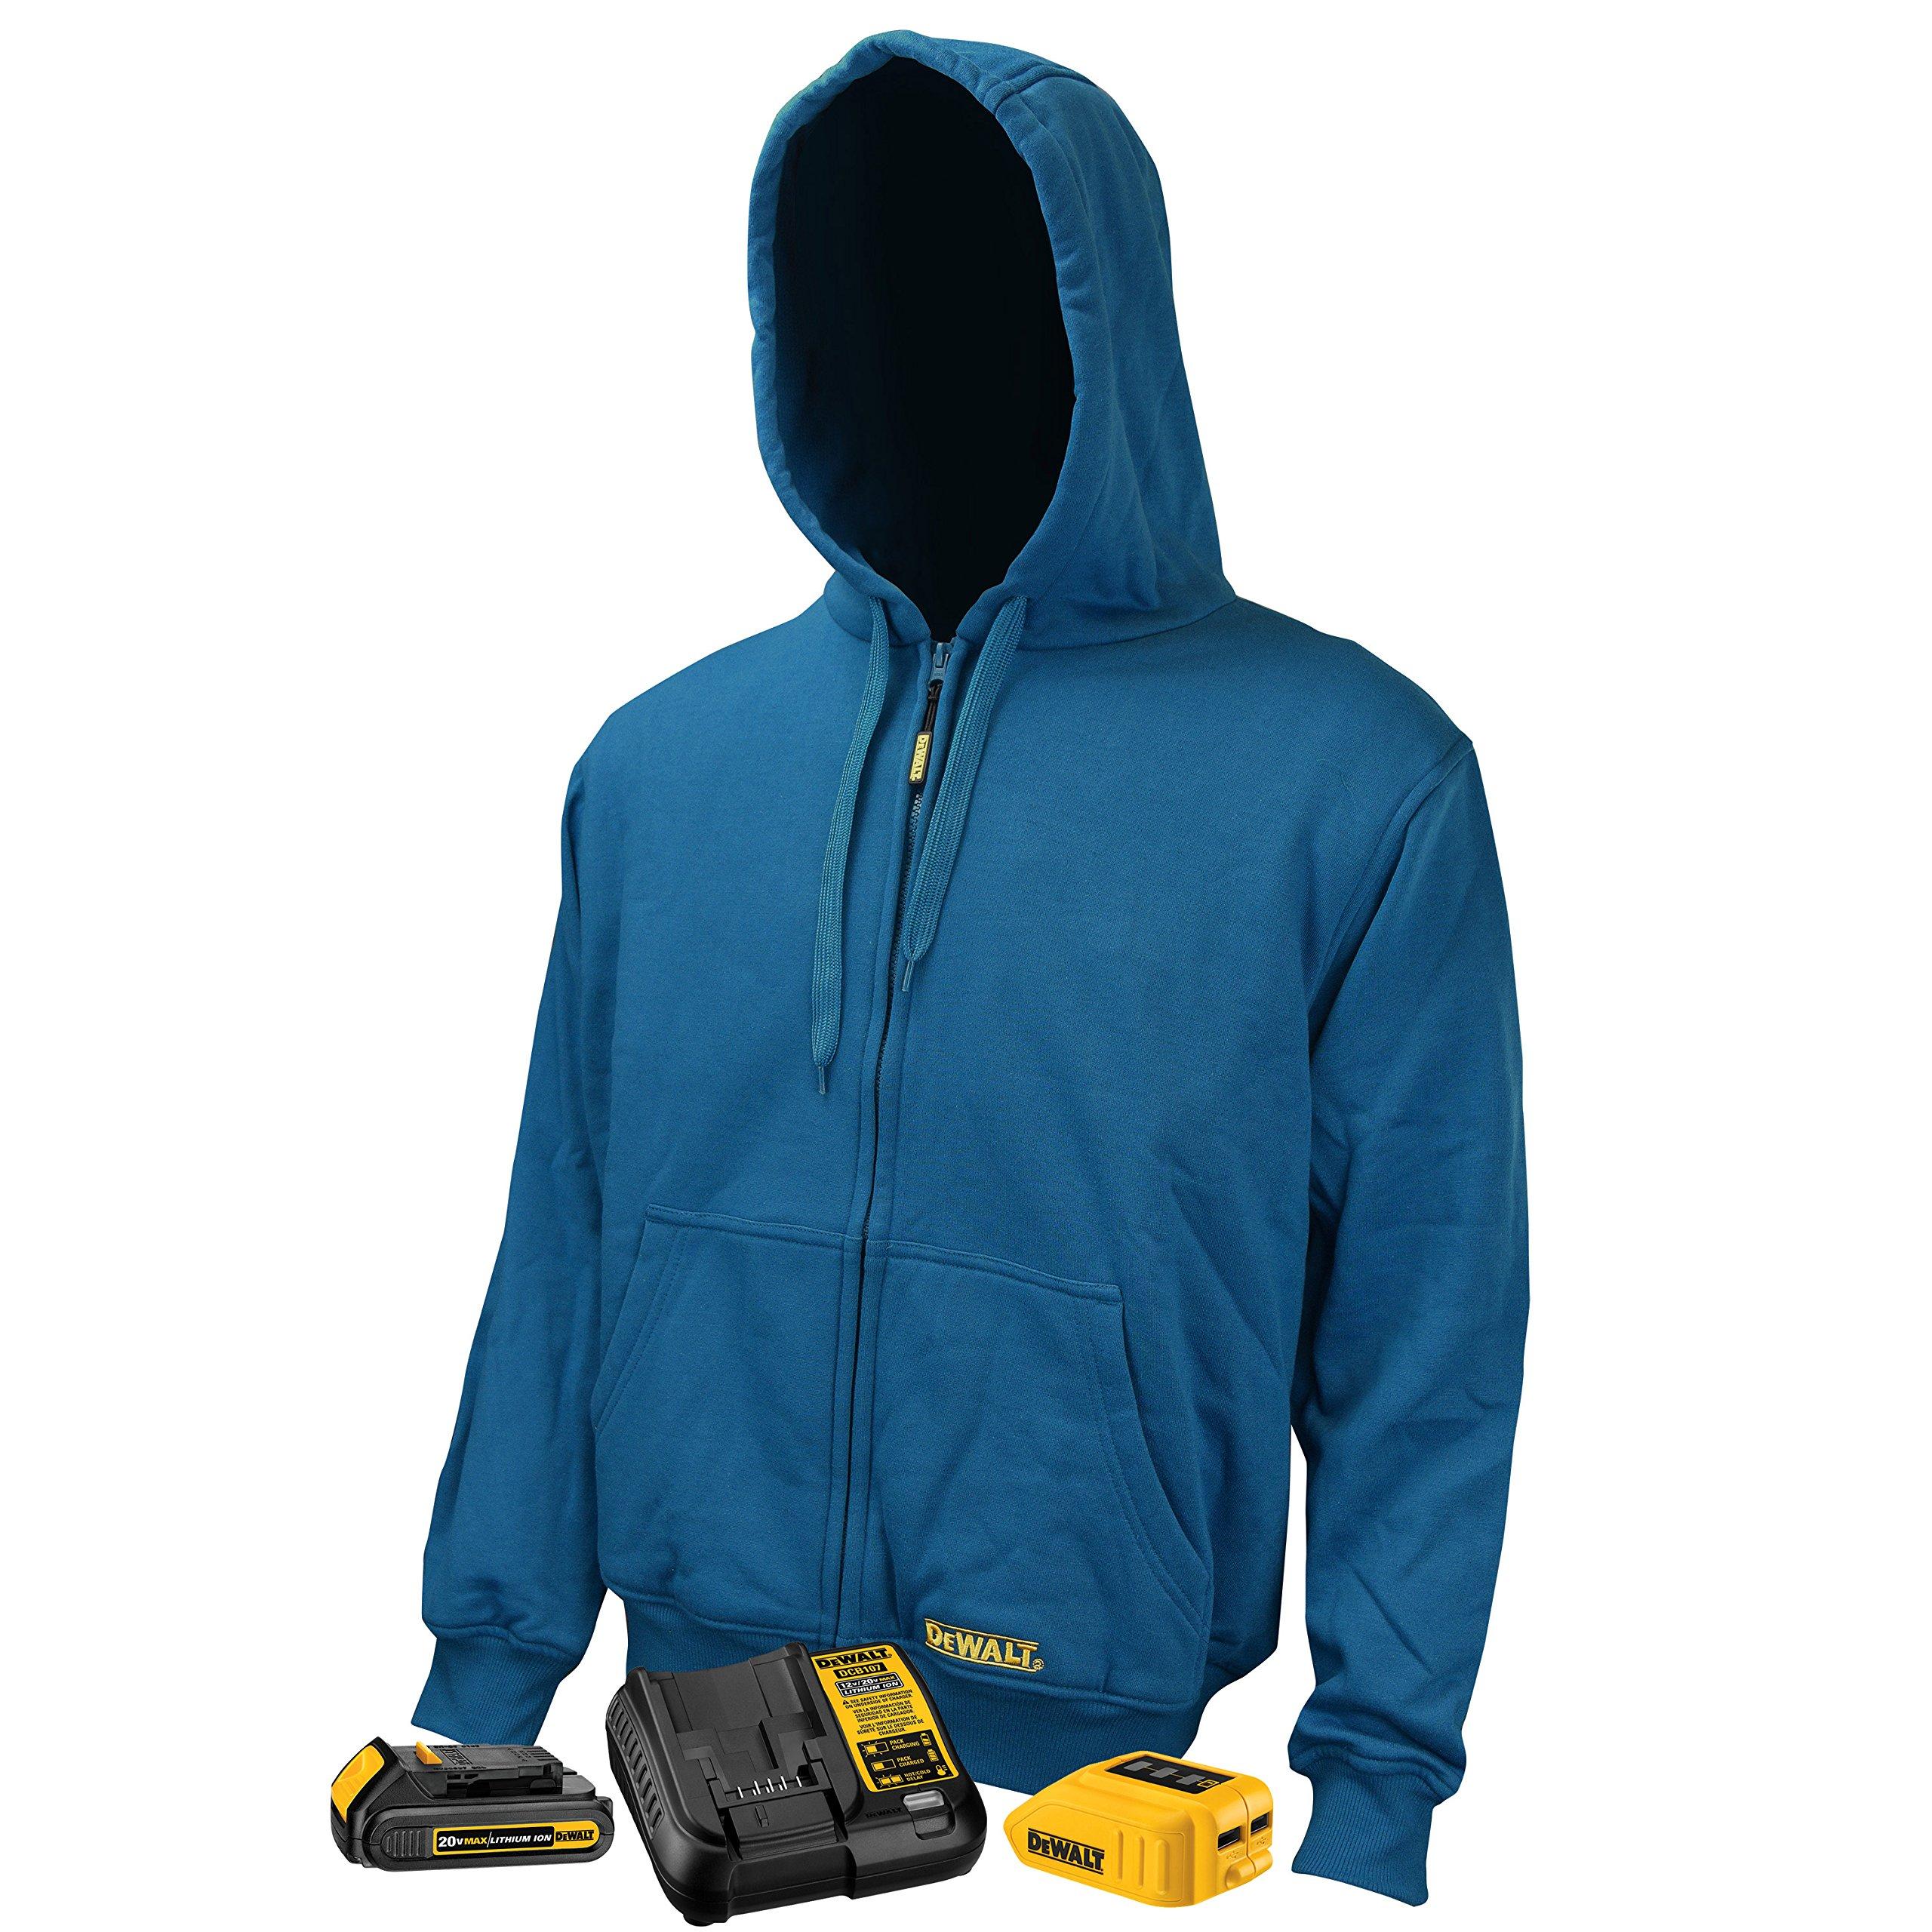 DEWALT DCHJ069C1-M Blue Fleece Heated Hoodie